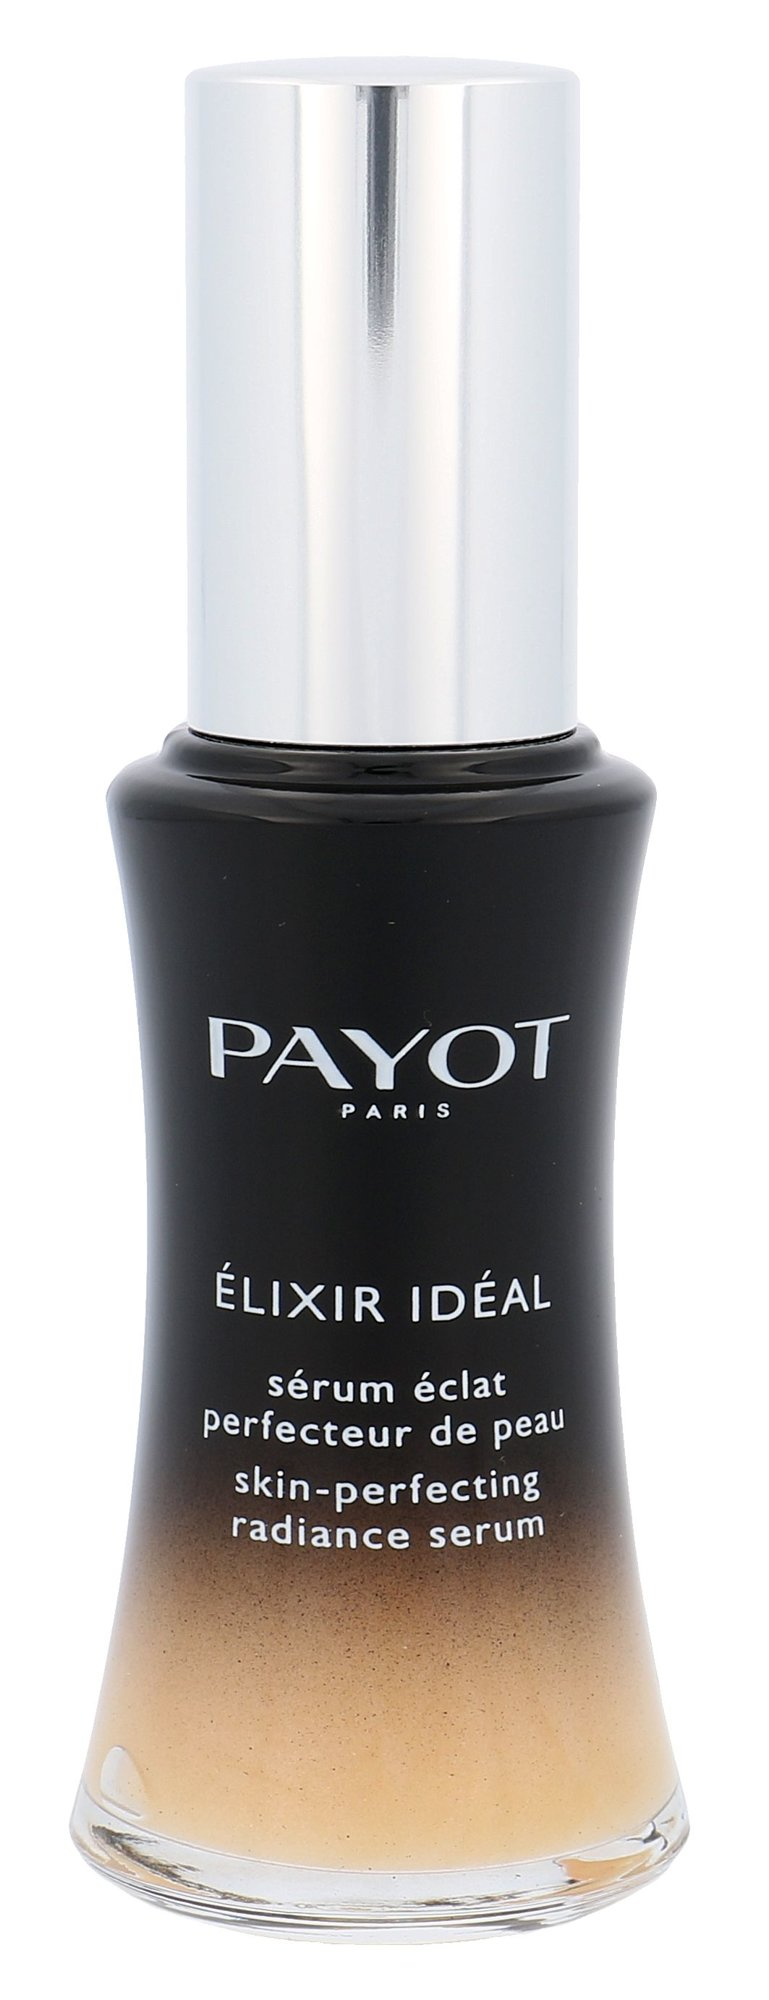 PAYOT Les Elixirs Cosmetic 30ml  Elixir Ideal